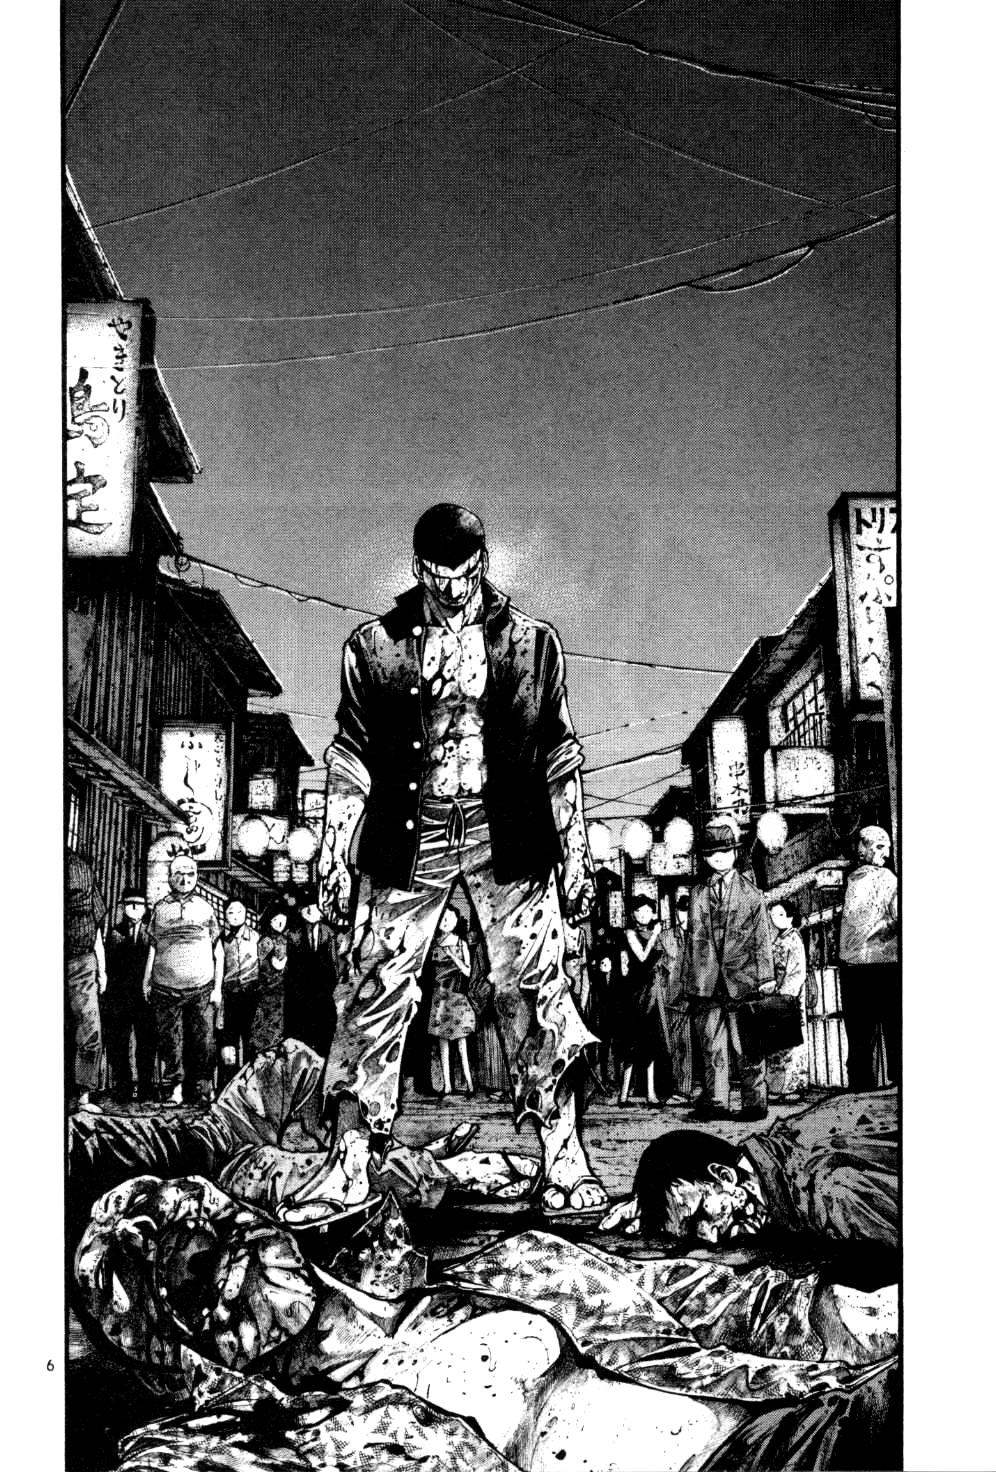 https://r2.ninemanga.com/comics/pic3/55/35447/1277589/1542453746964.jpg Page 18